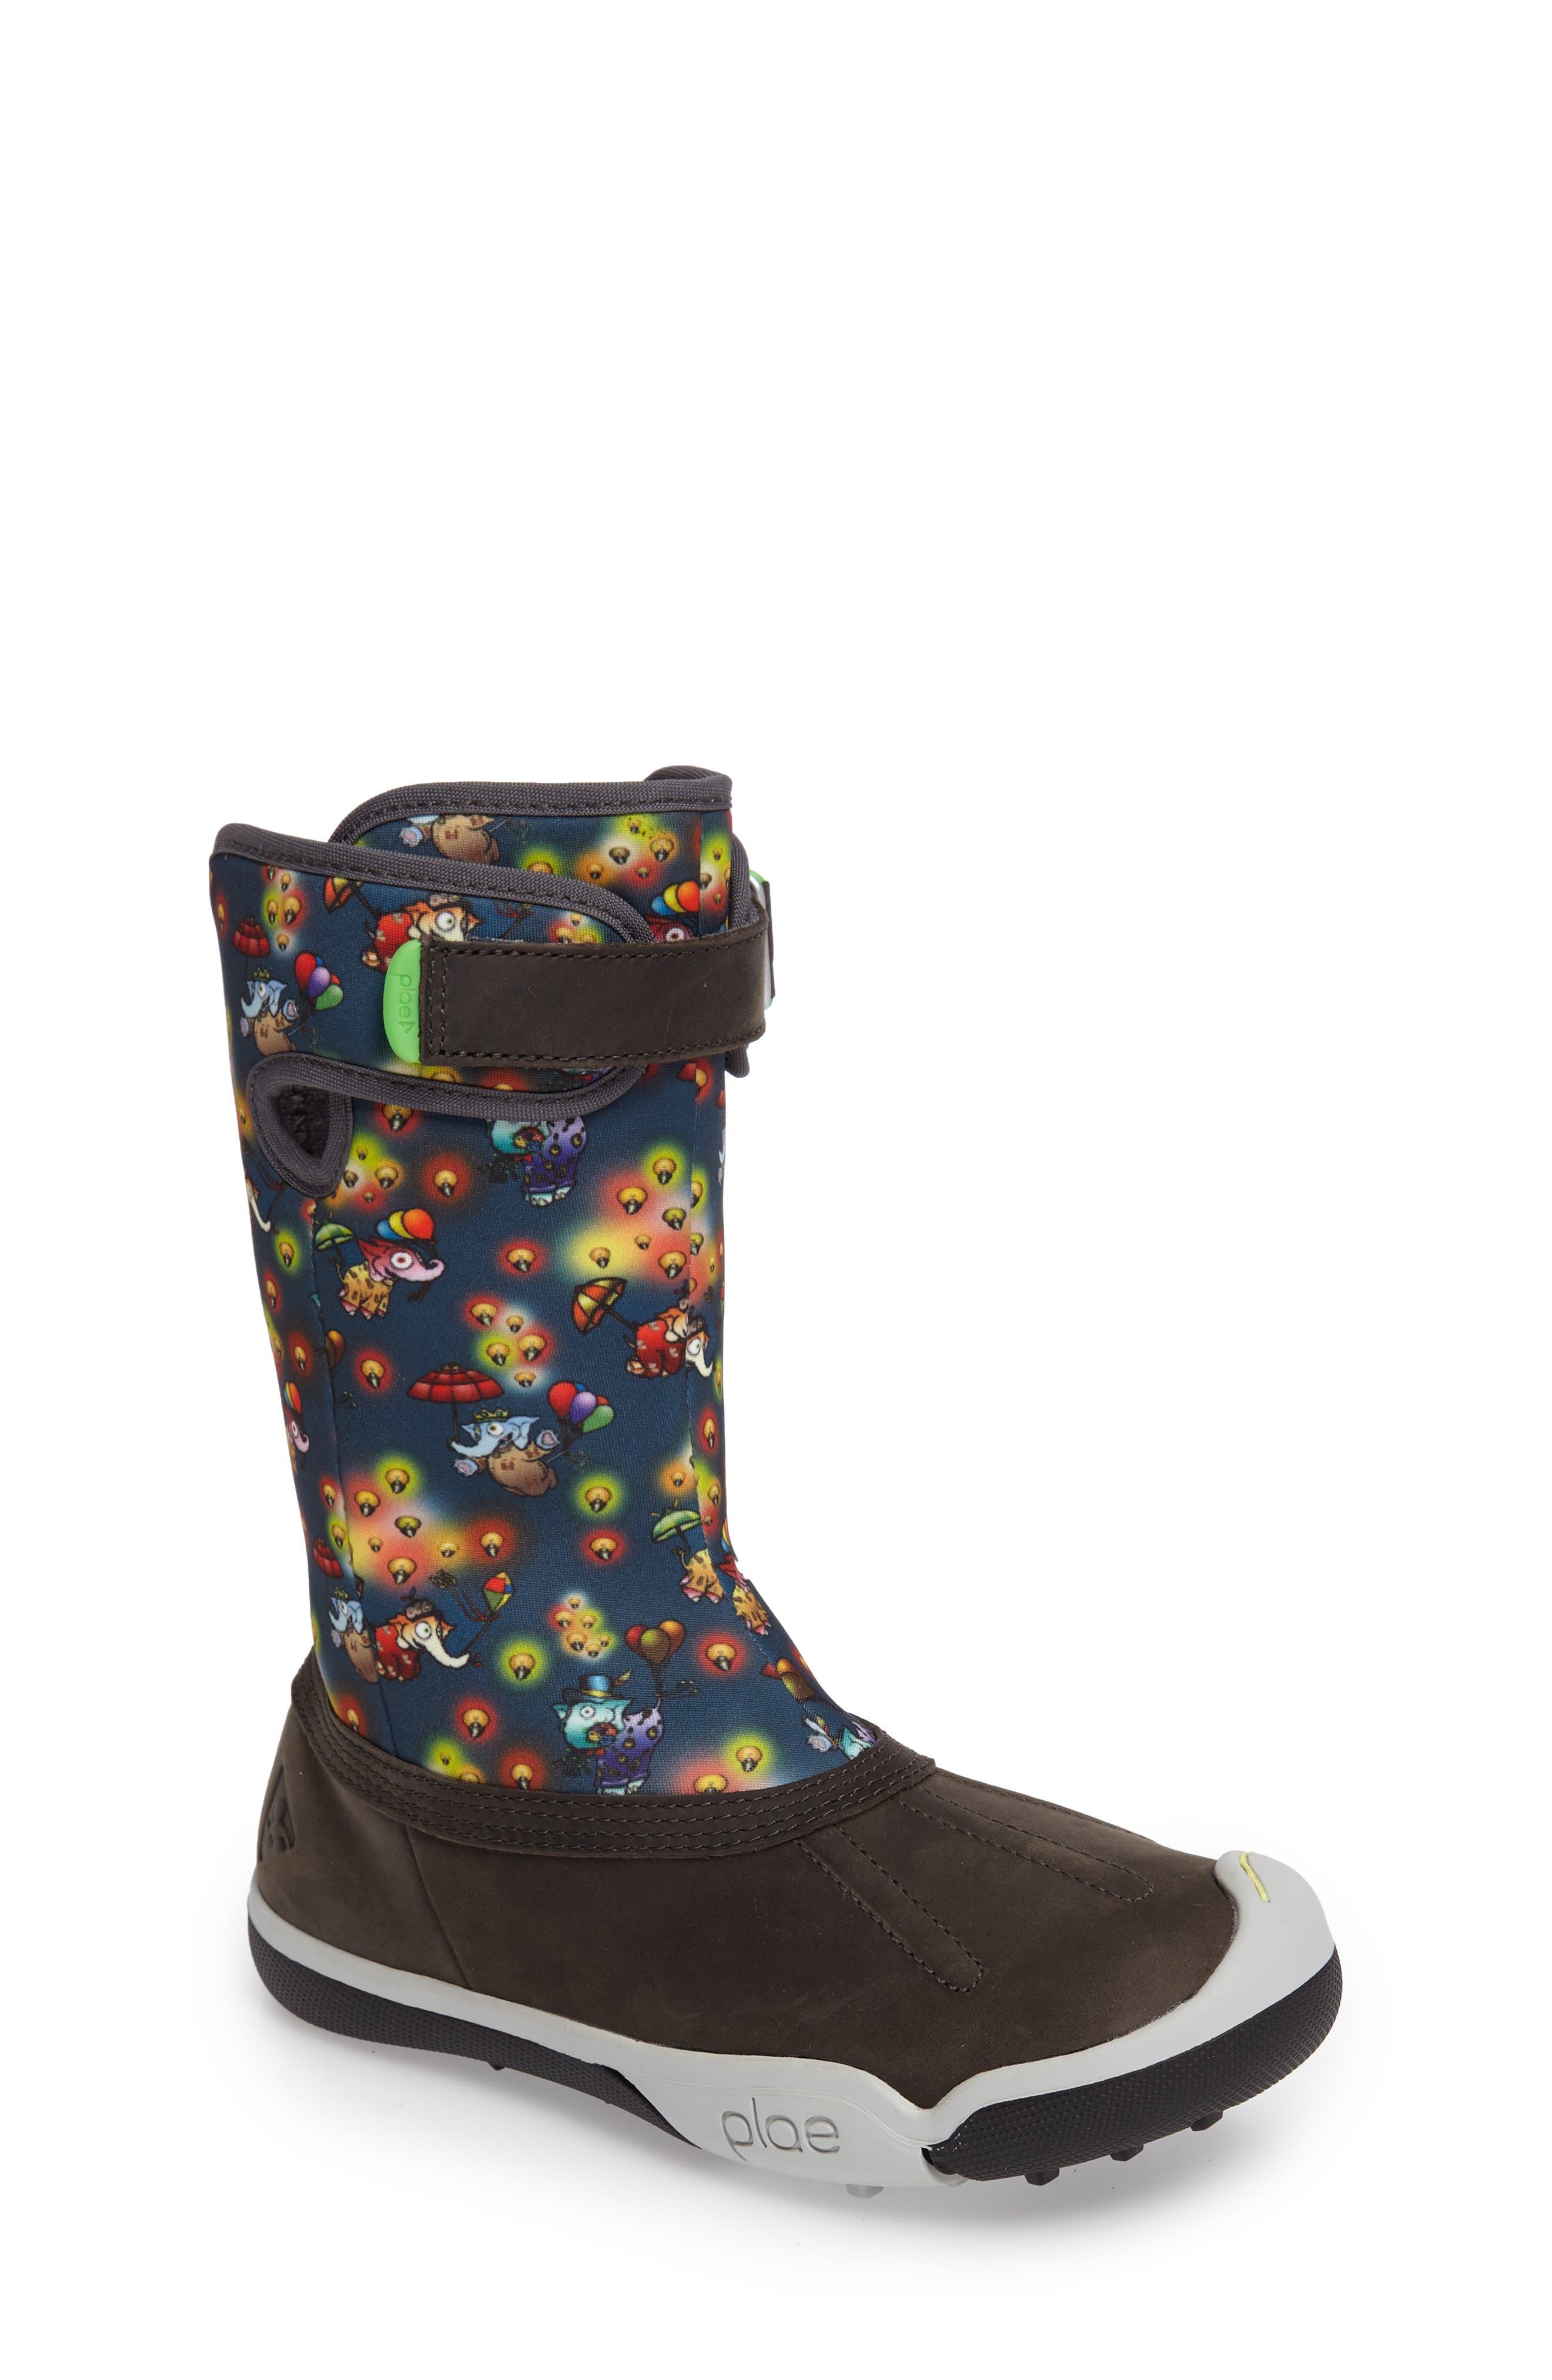 PLAE Thandi Customizable Rain Boot (Toddler, Little Kid & Big Kid)